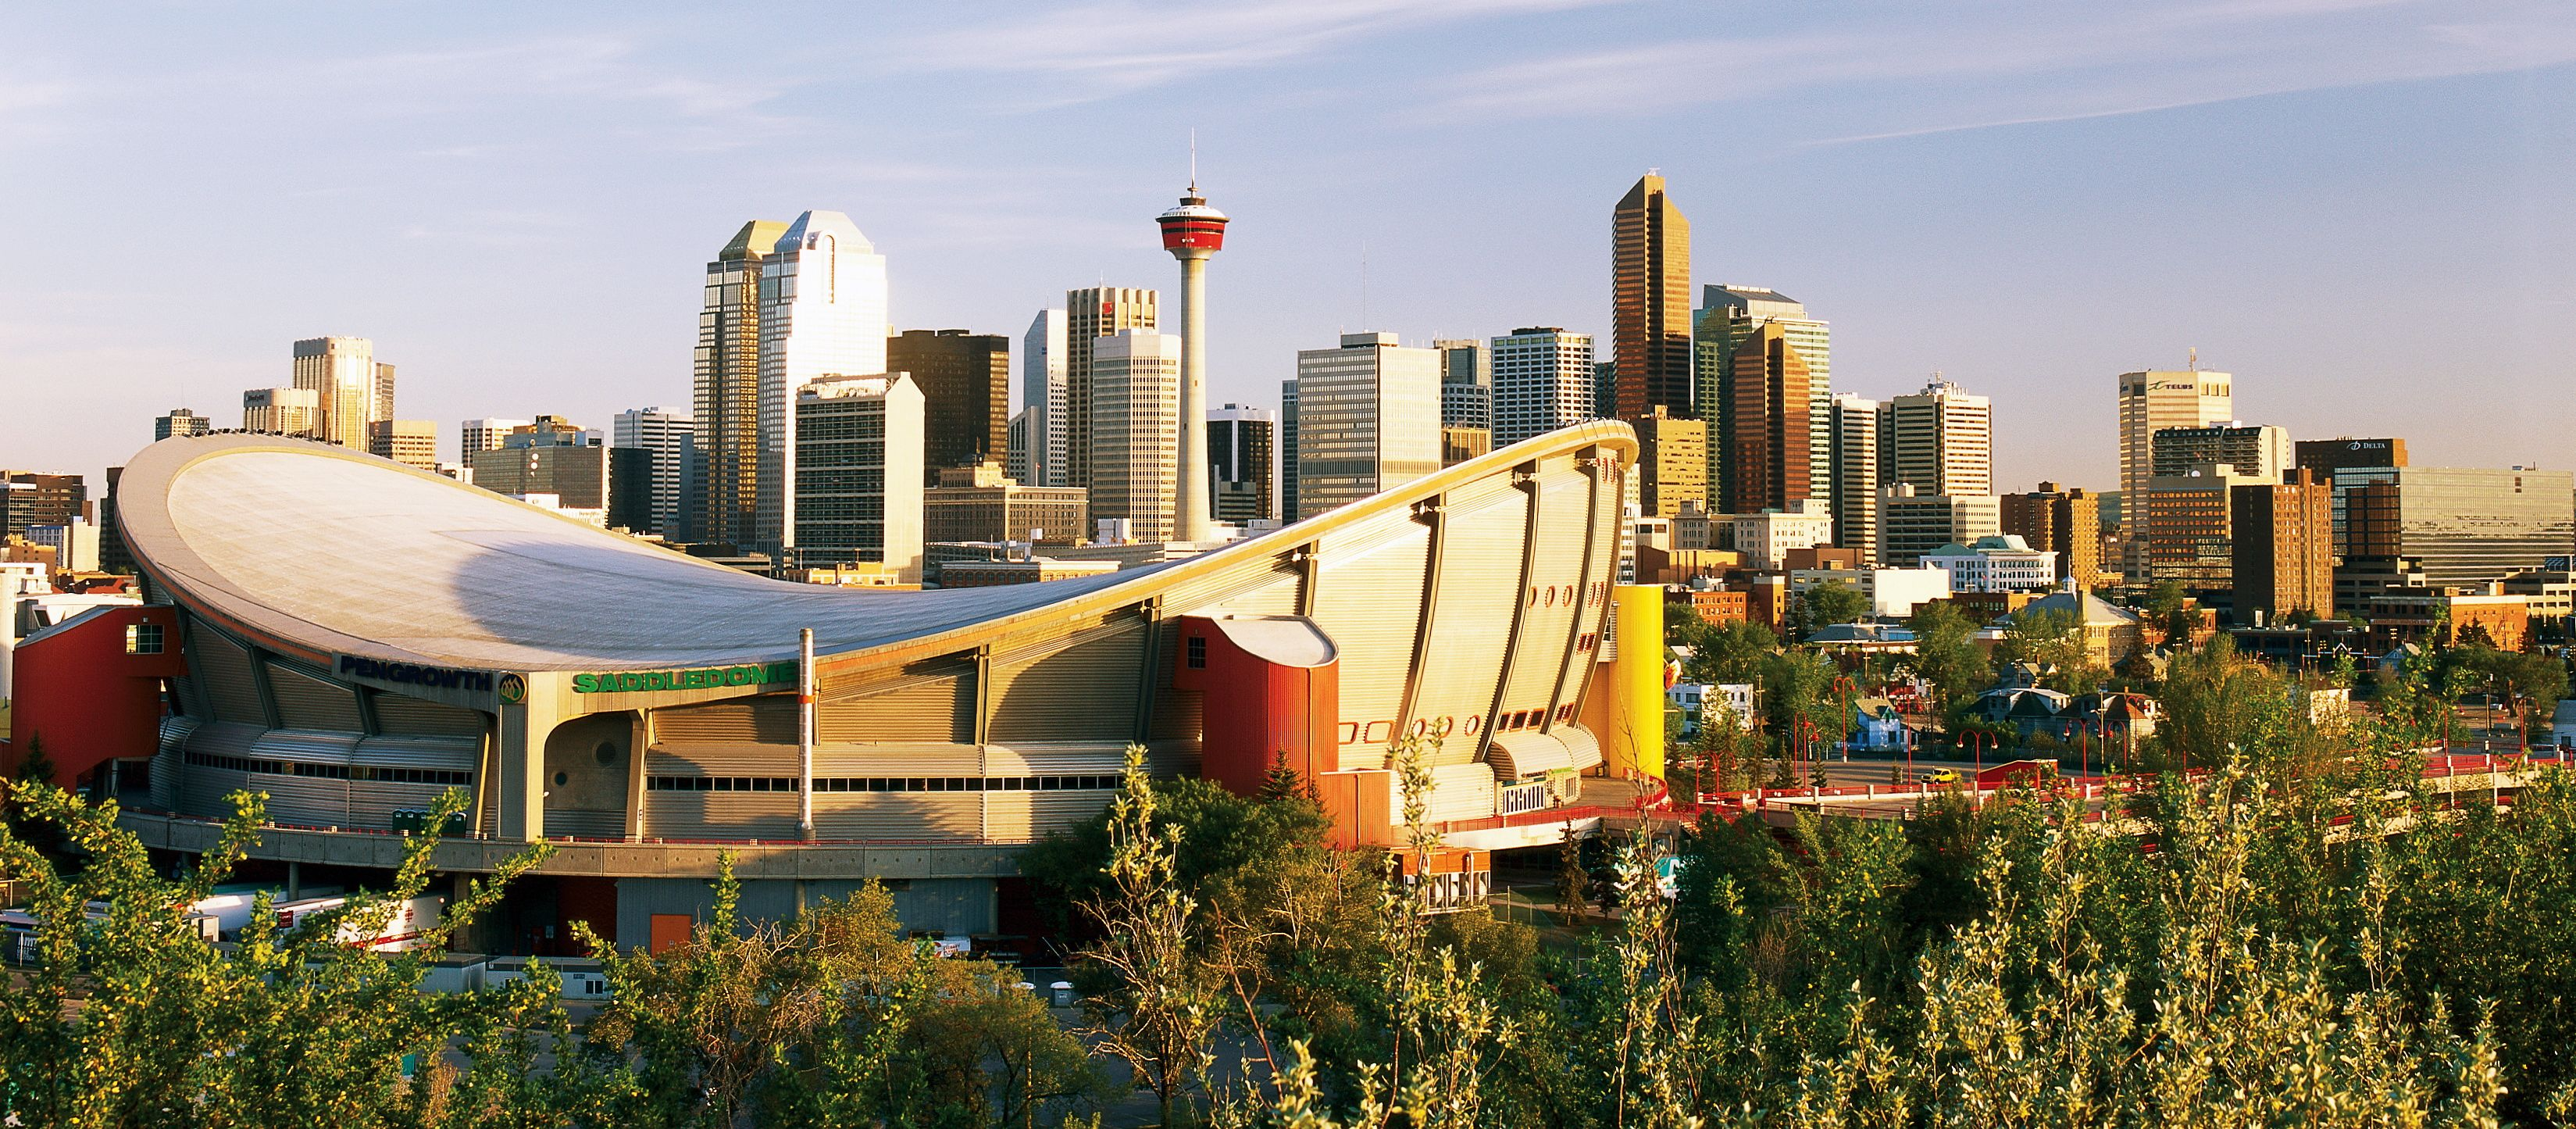 Impressionen Hop-on Hop-off Tour of Calgary